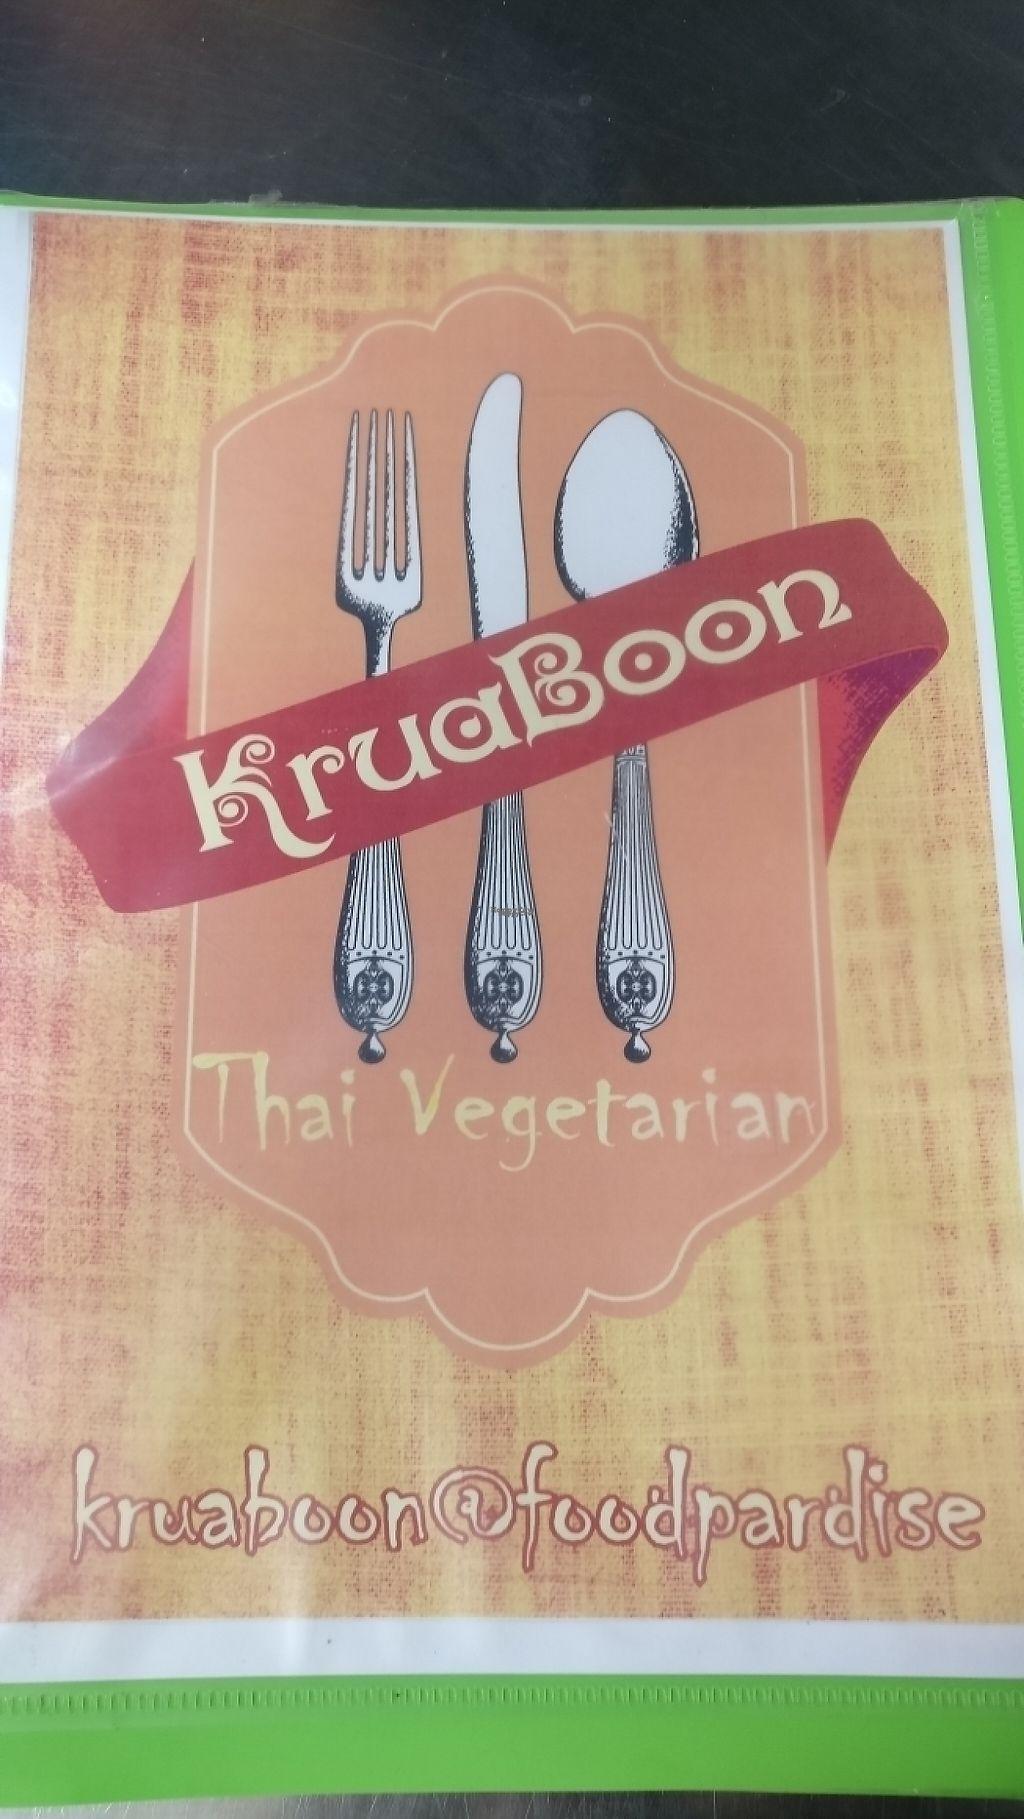 "Photo of Kran Boom Modern Thai  by <a href=""/members/profile/davidredstone"">davidredstone</a> <br/>Krua Boon menu cover  <br/> March 19, 2017  - <a href='/contact/abuse/image/38060/238233'>Report</a>"